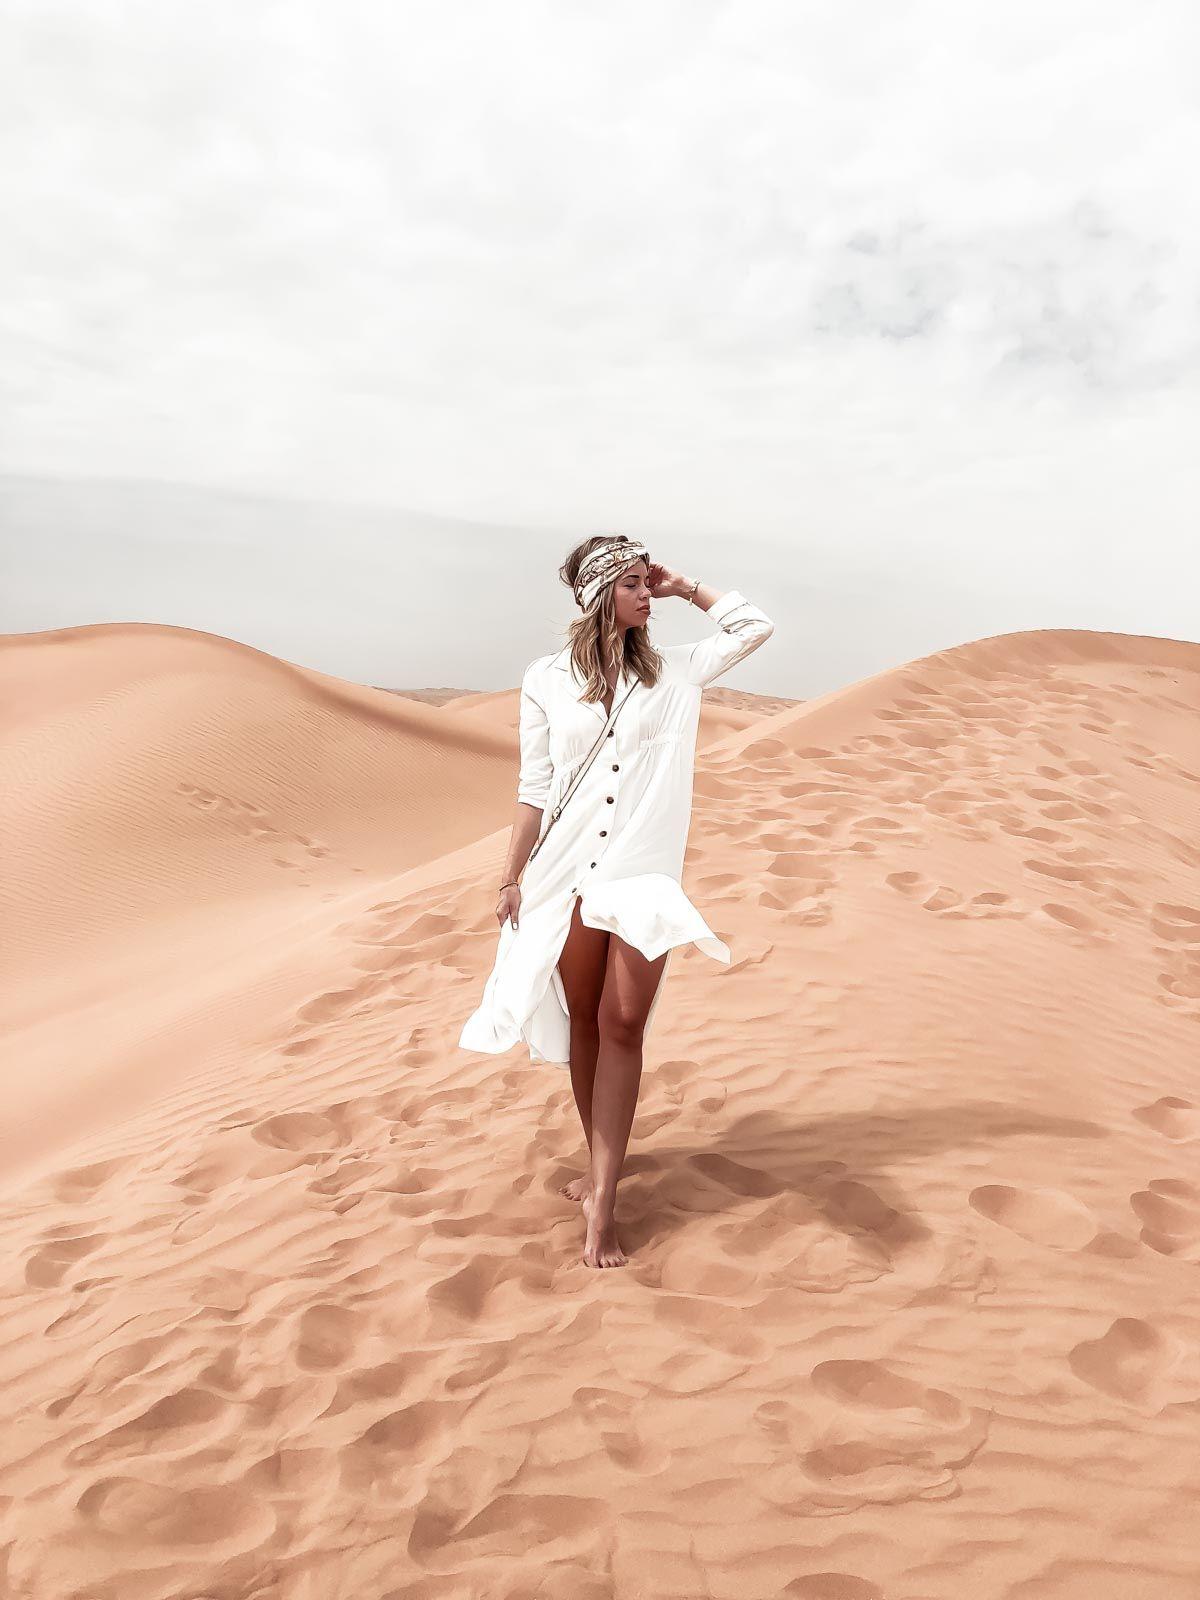 Dubai Desert Safari Dubai Urlaub Reisen Outfit Sommer Und Dubai